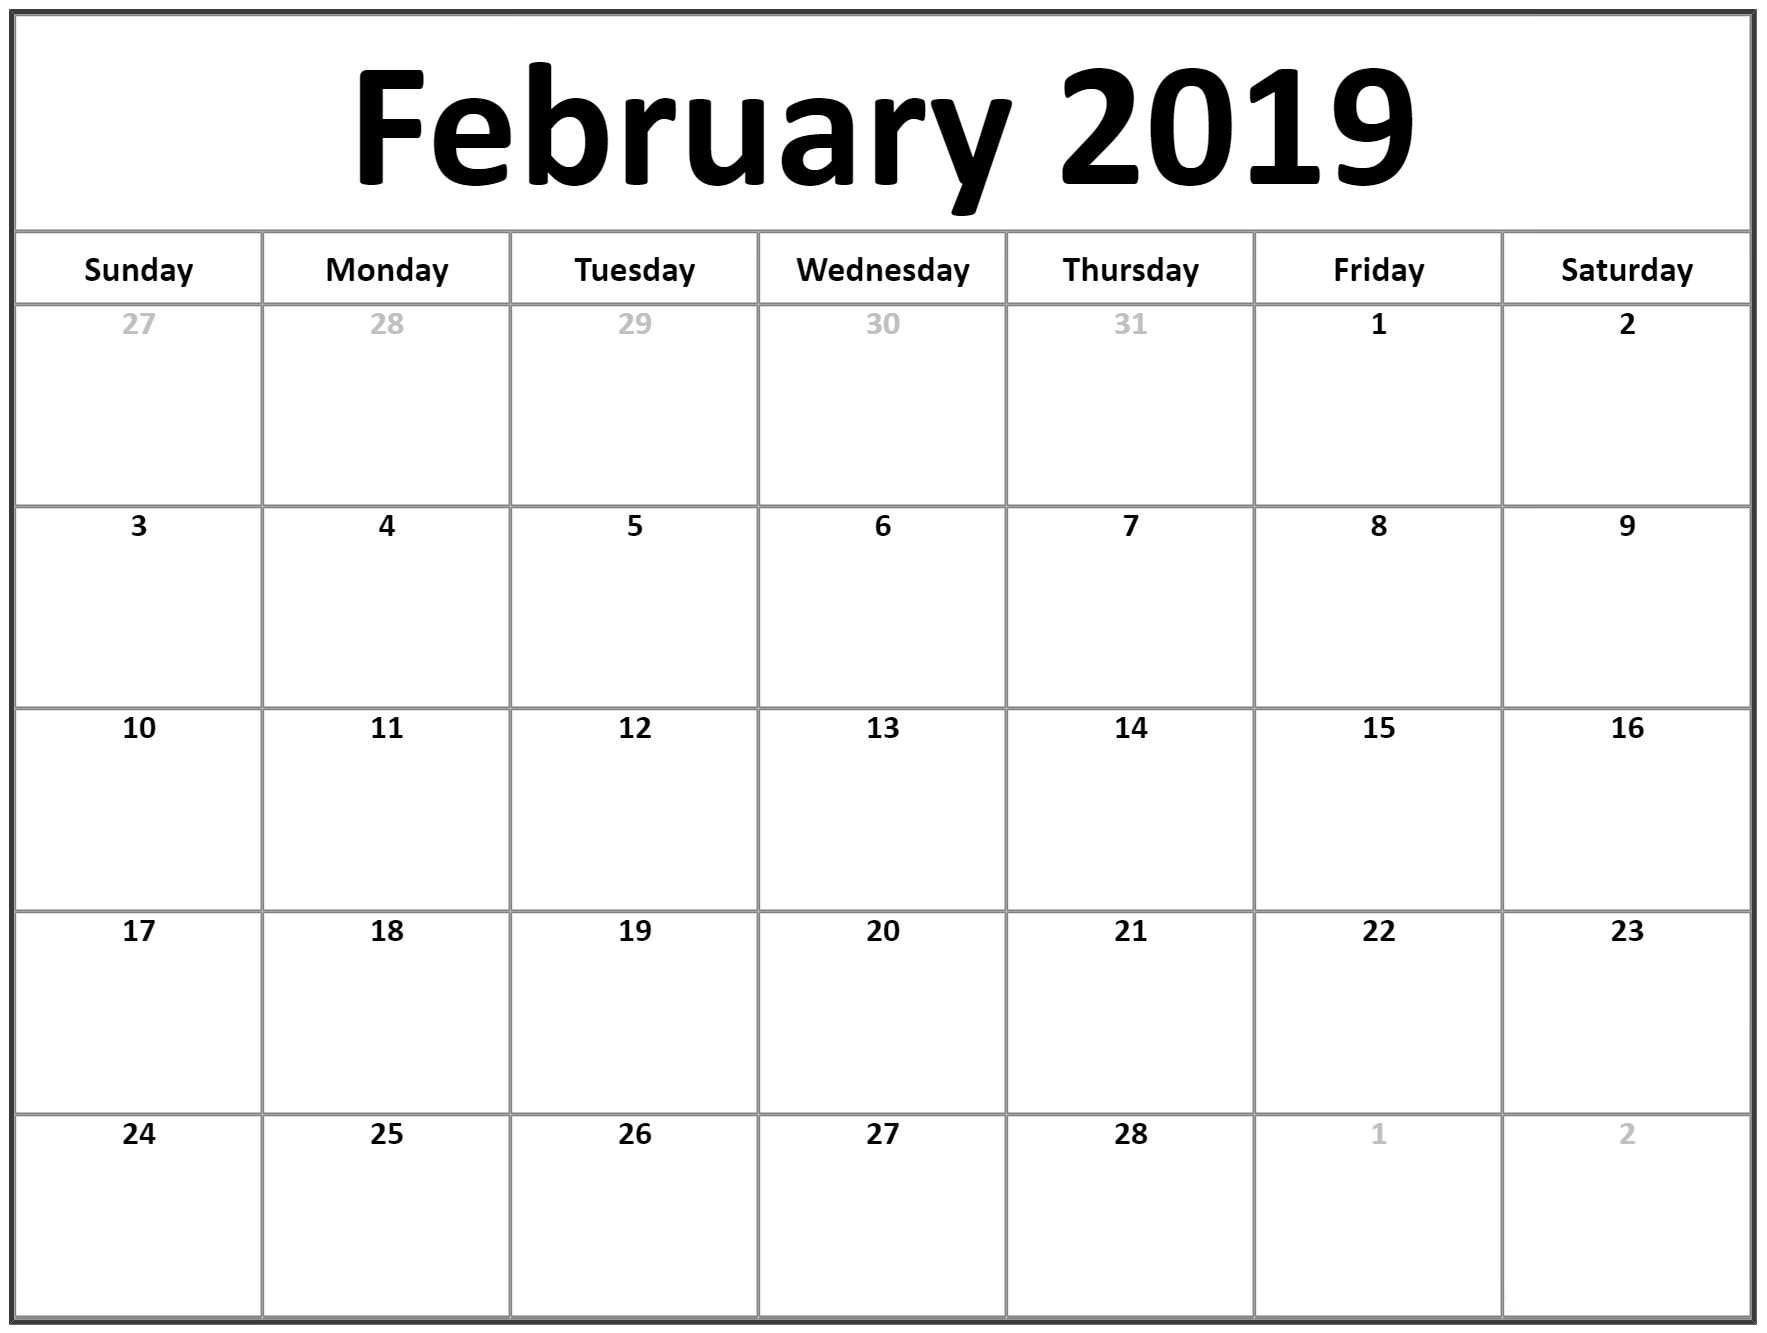 Blank Calendar For February 2019 Blank Calendar For February 2019   Free Printable Calendar